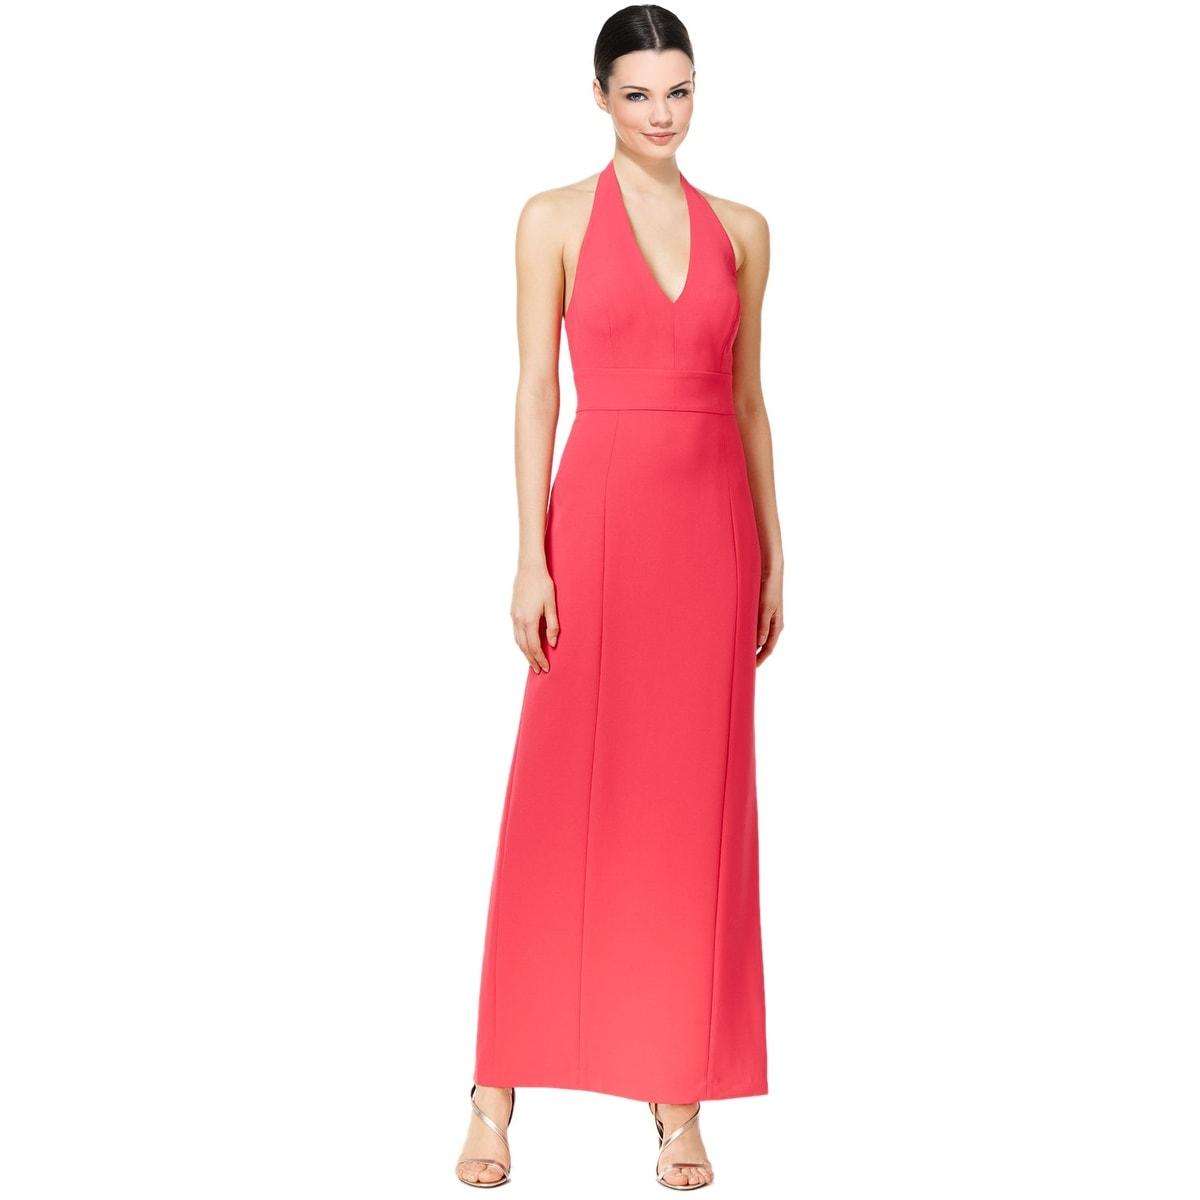 Calvin Klein Open Back Halter Neck Evening Gown Dress - Free ...